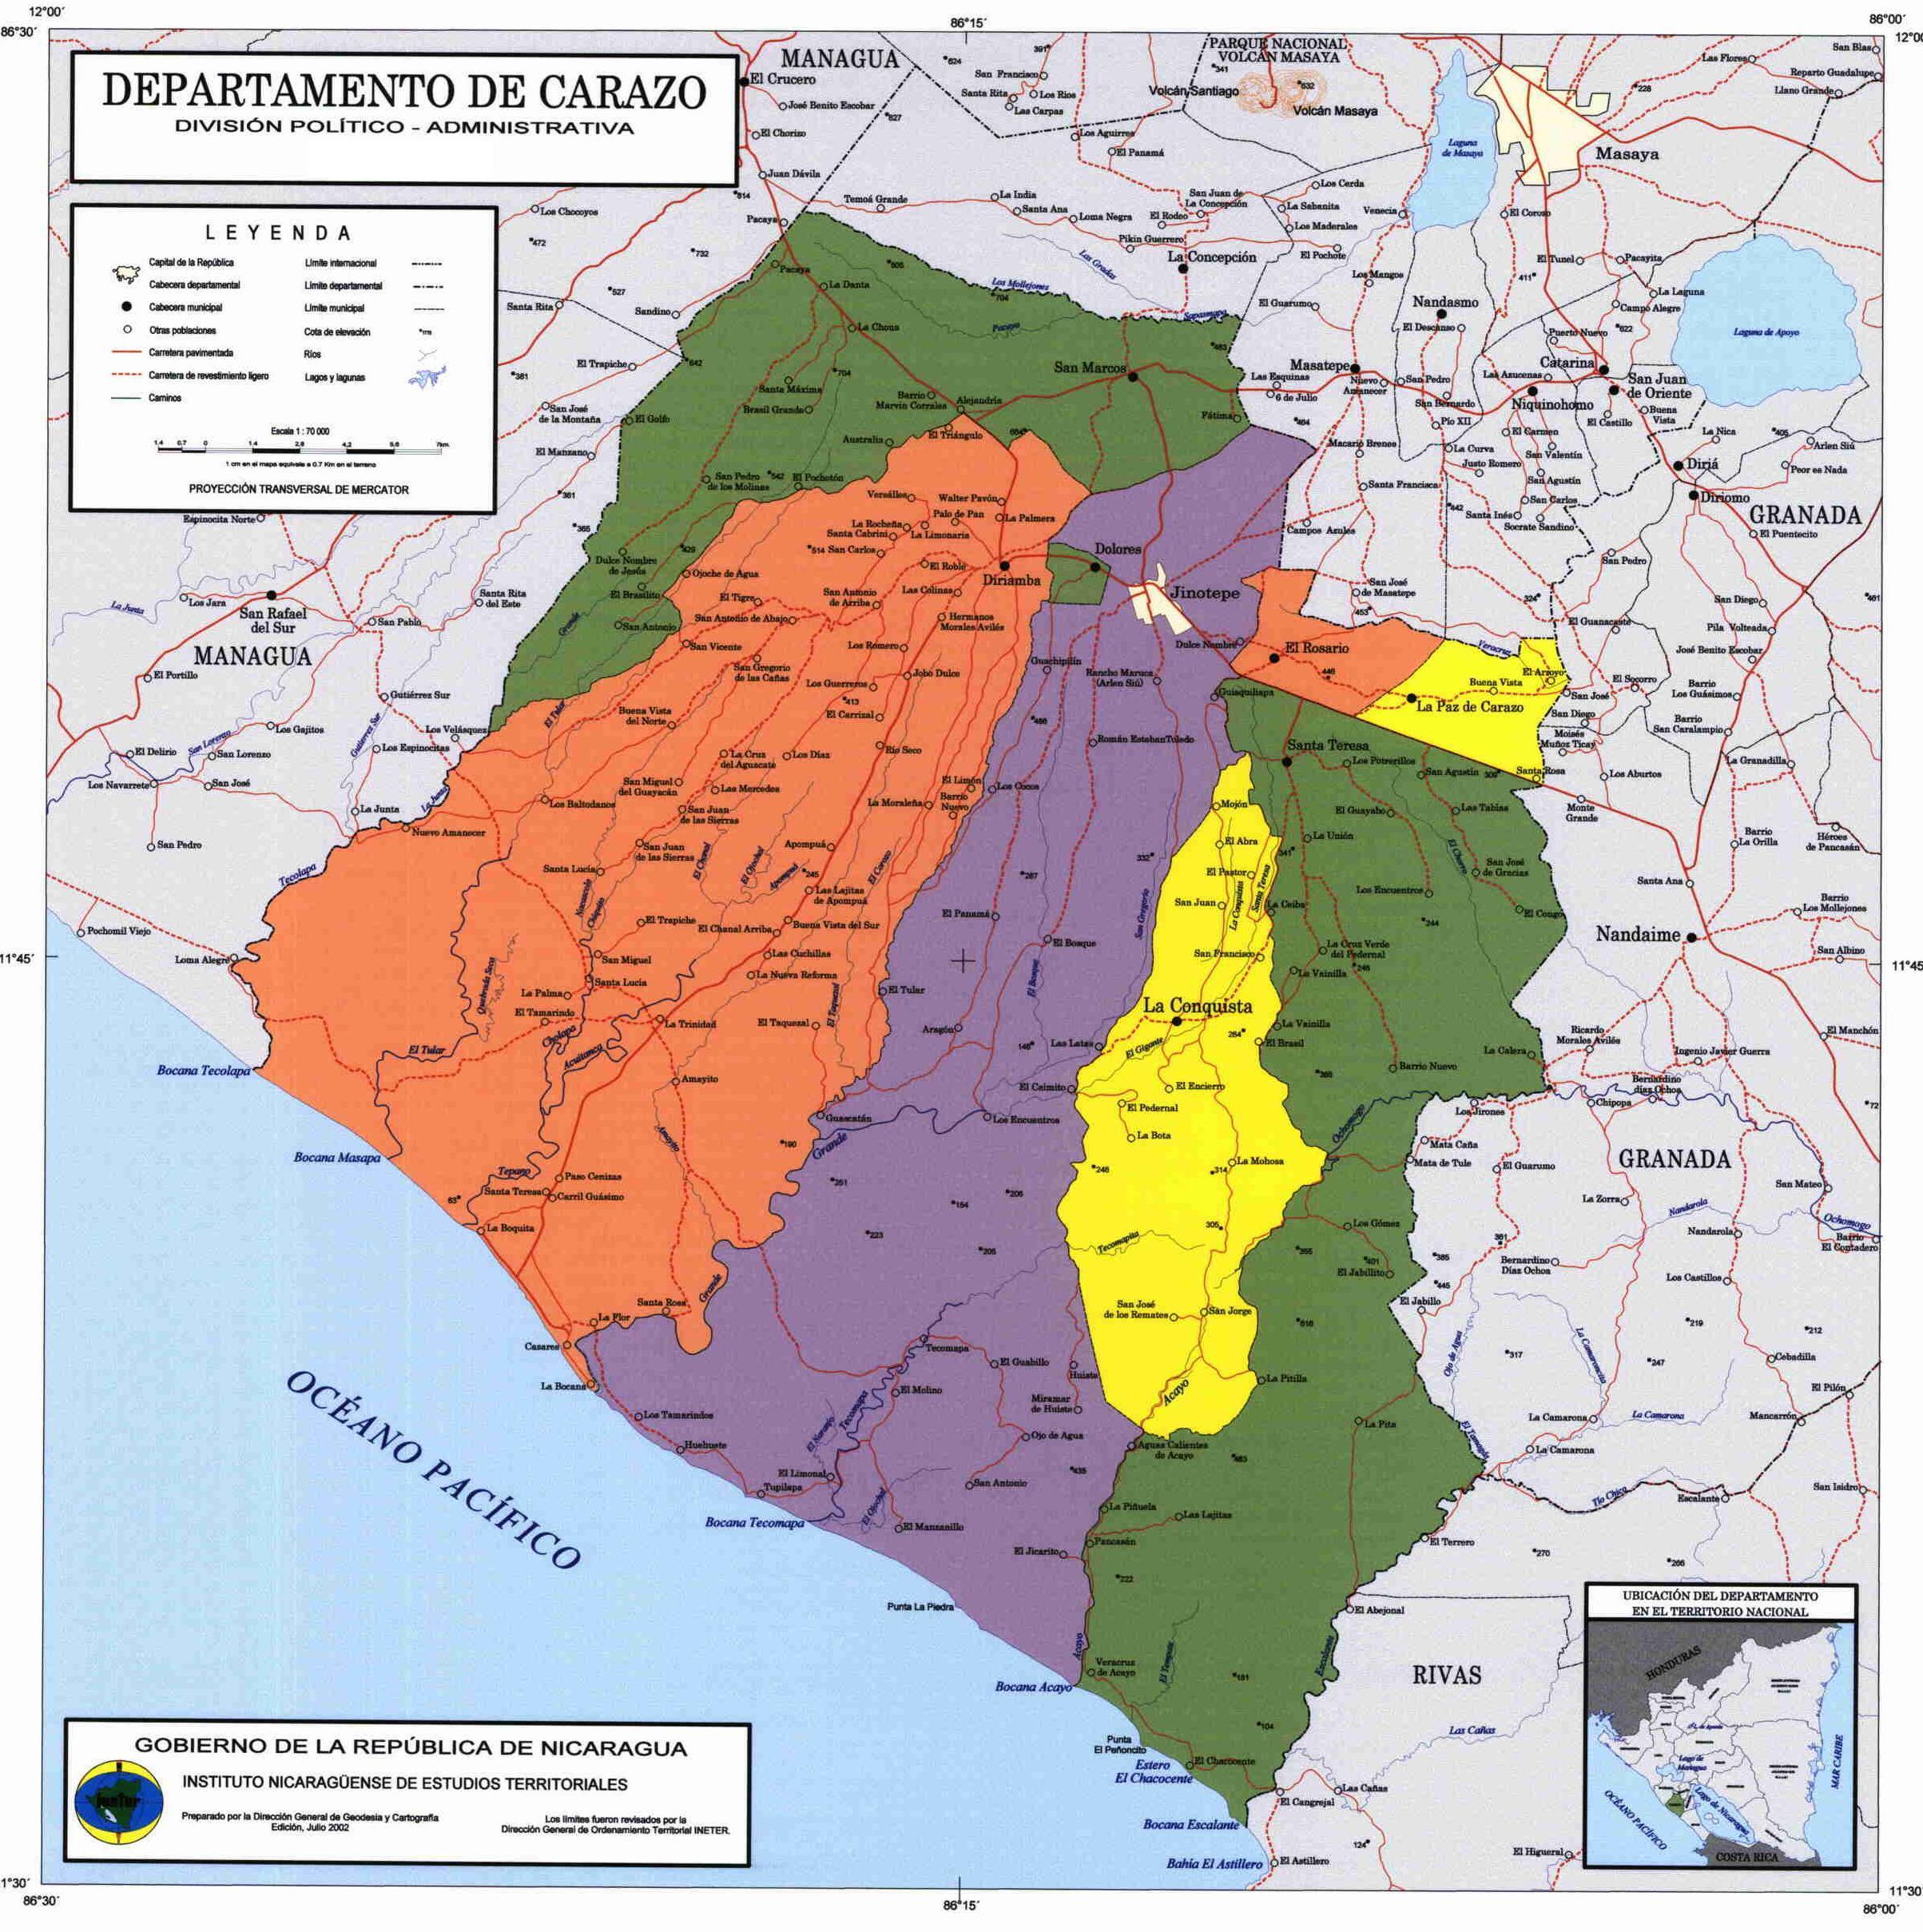 Carazo Department Administrative Political Map, Nicaragua